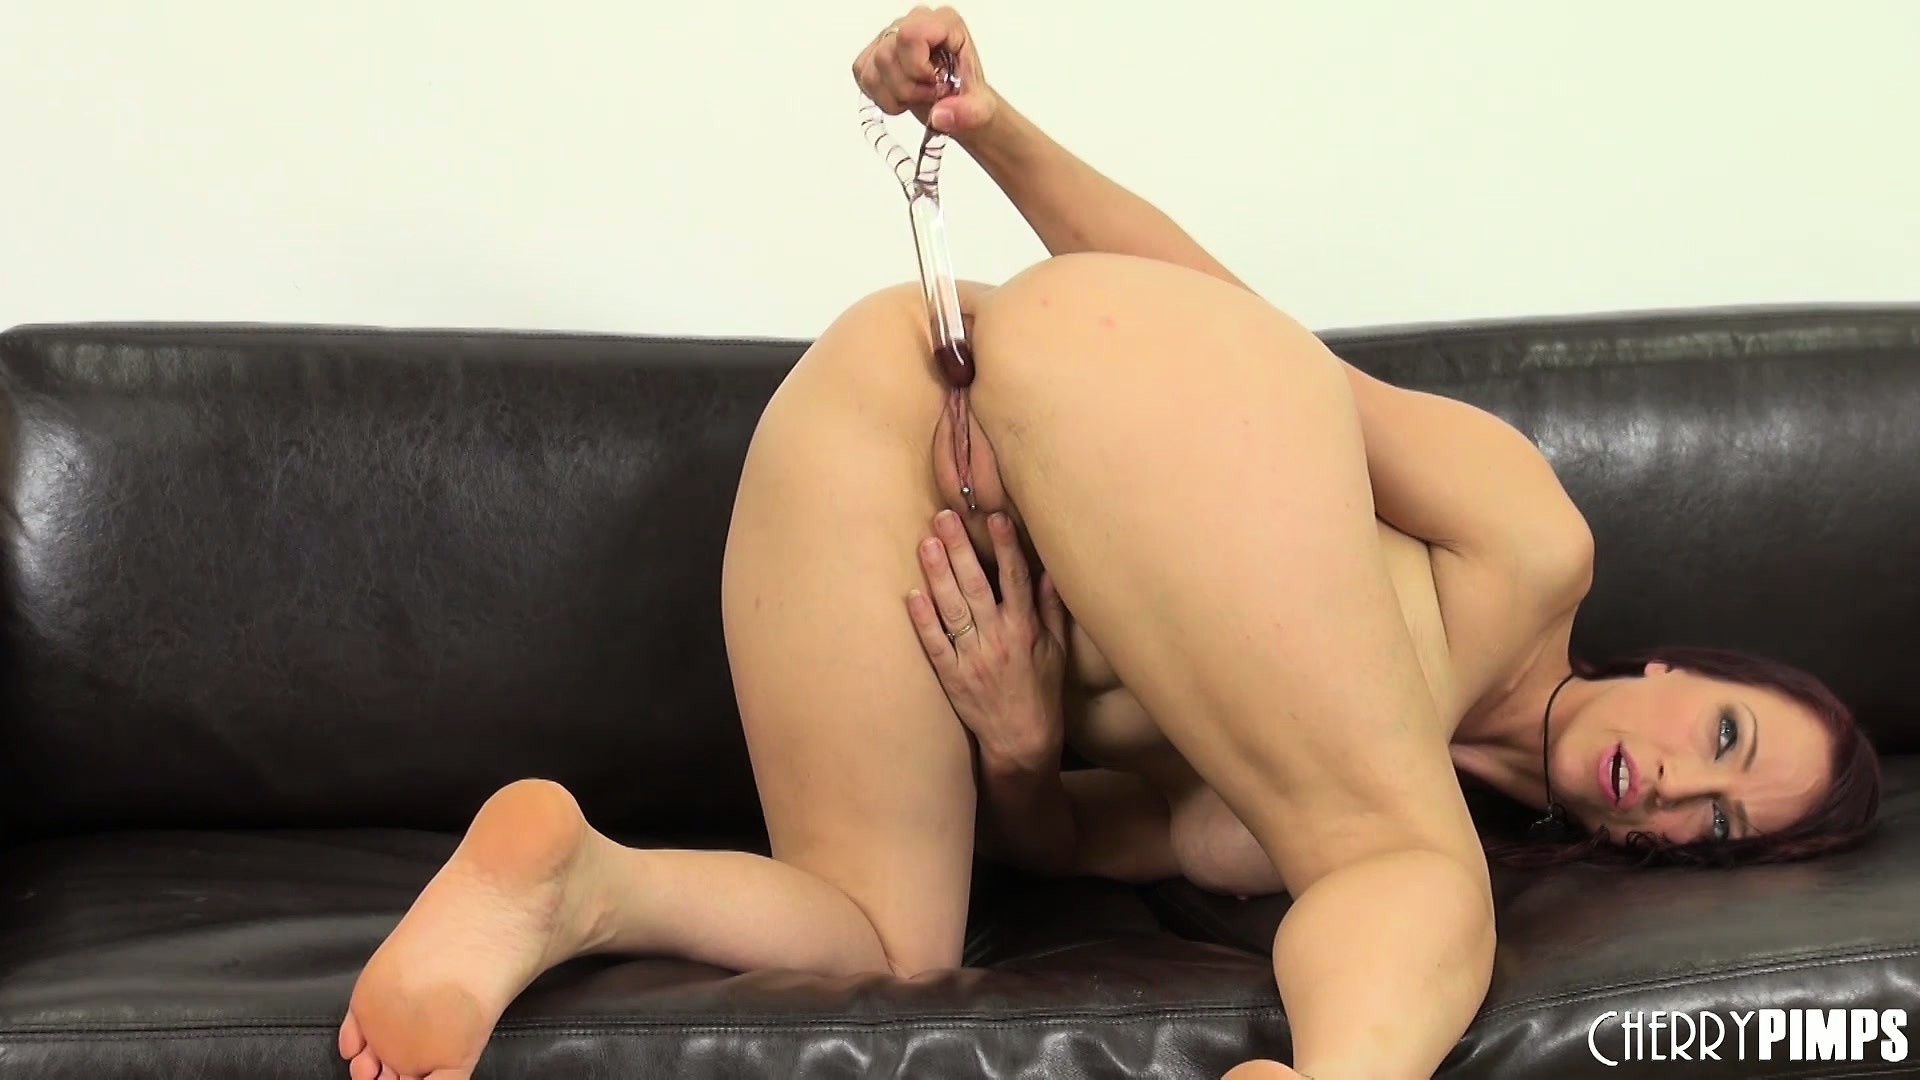 Bree olson bondage pics